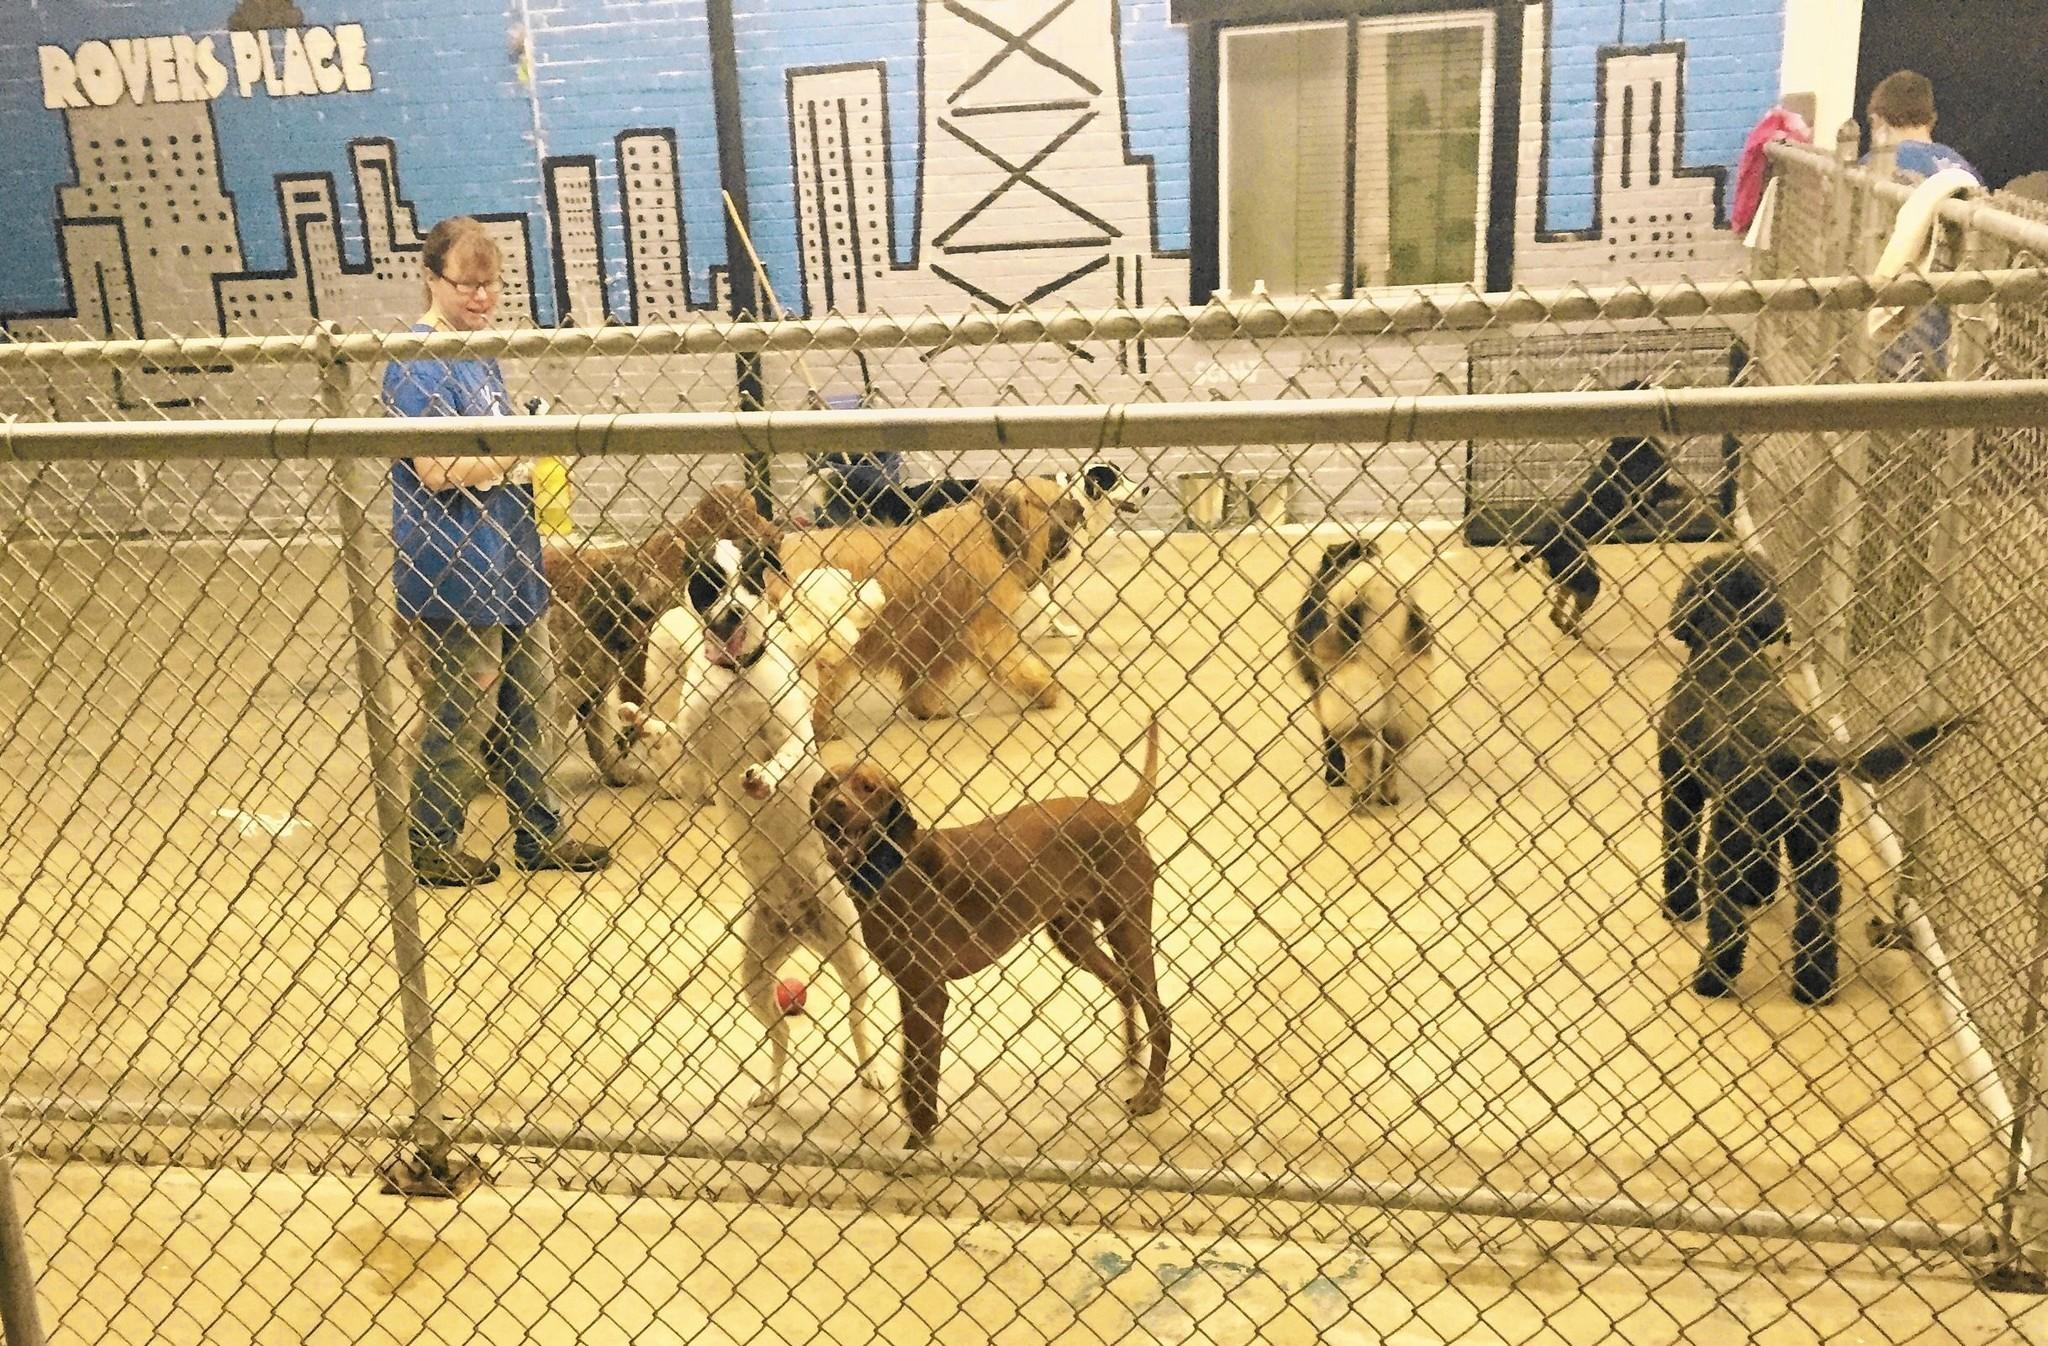 100 dog kennel planned for Northbrook s Skokie Boulevard